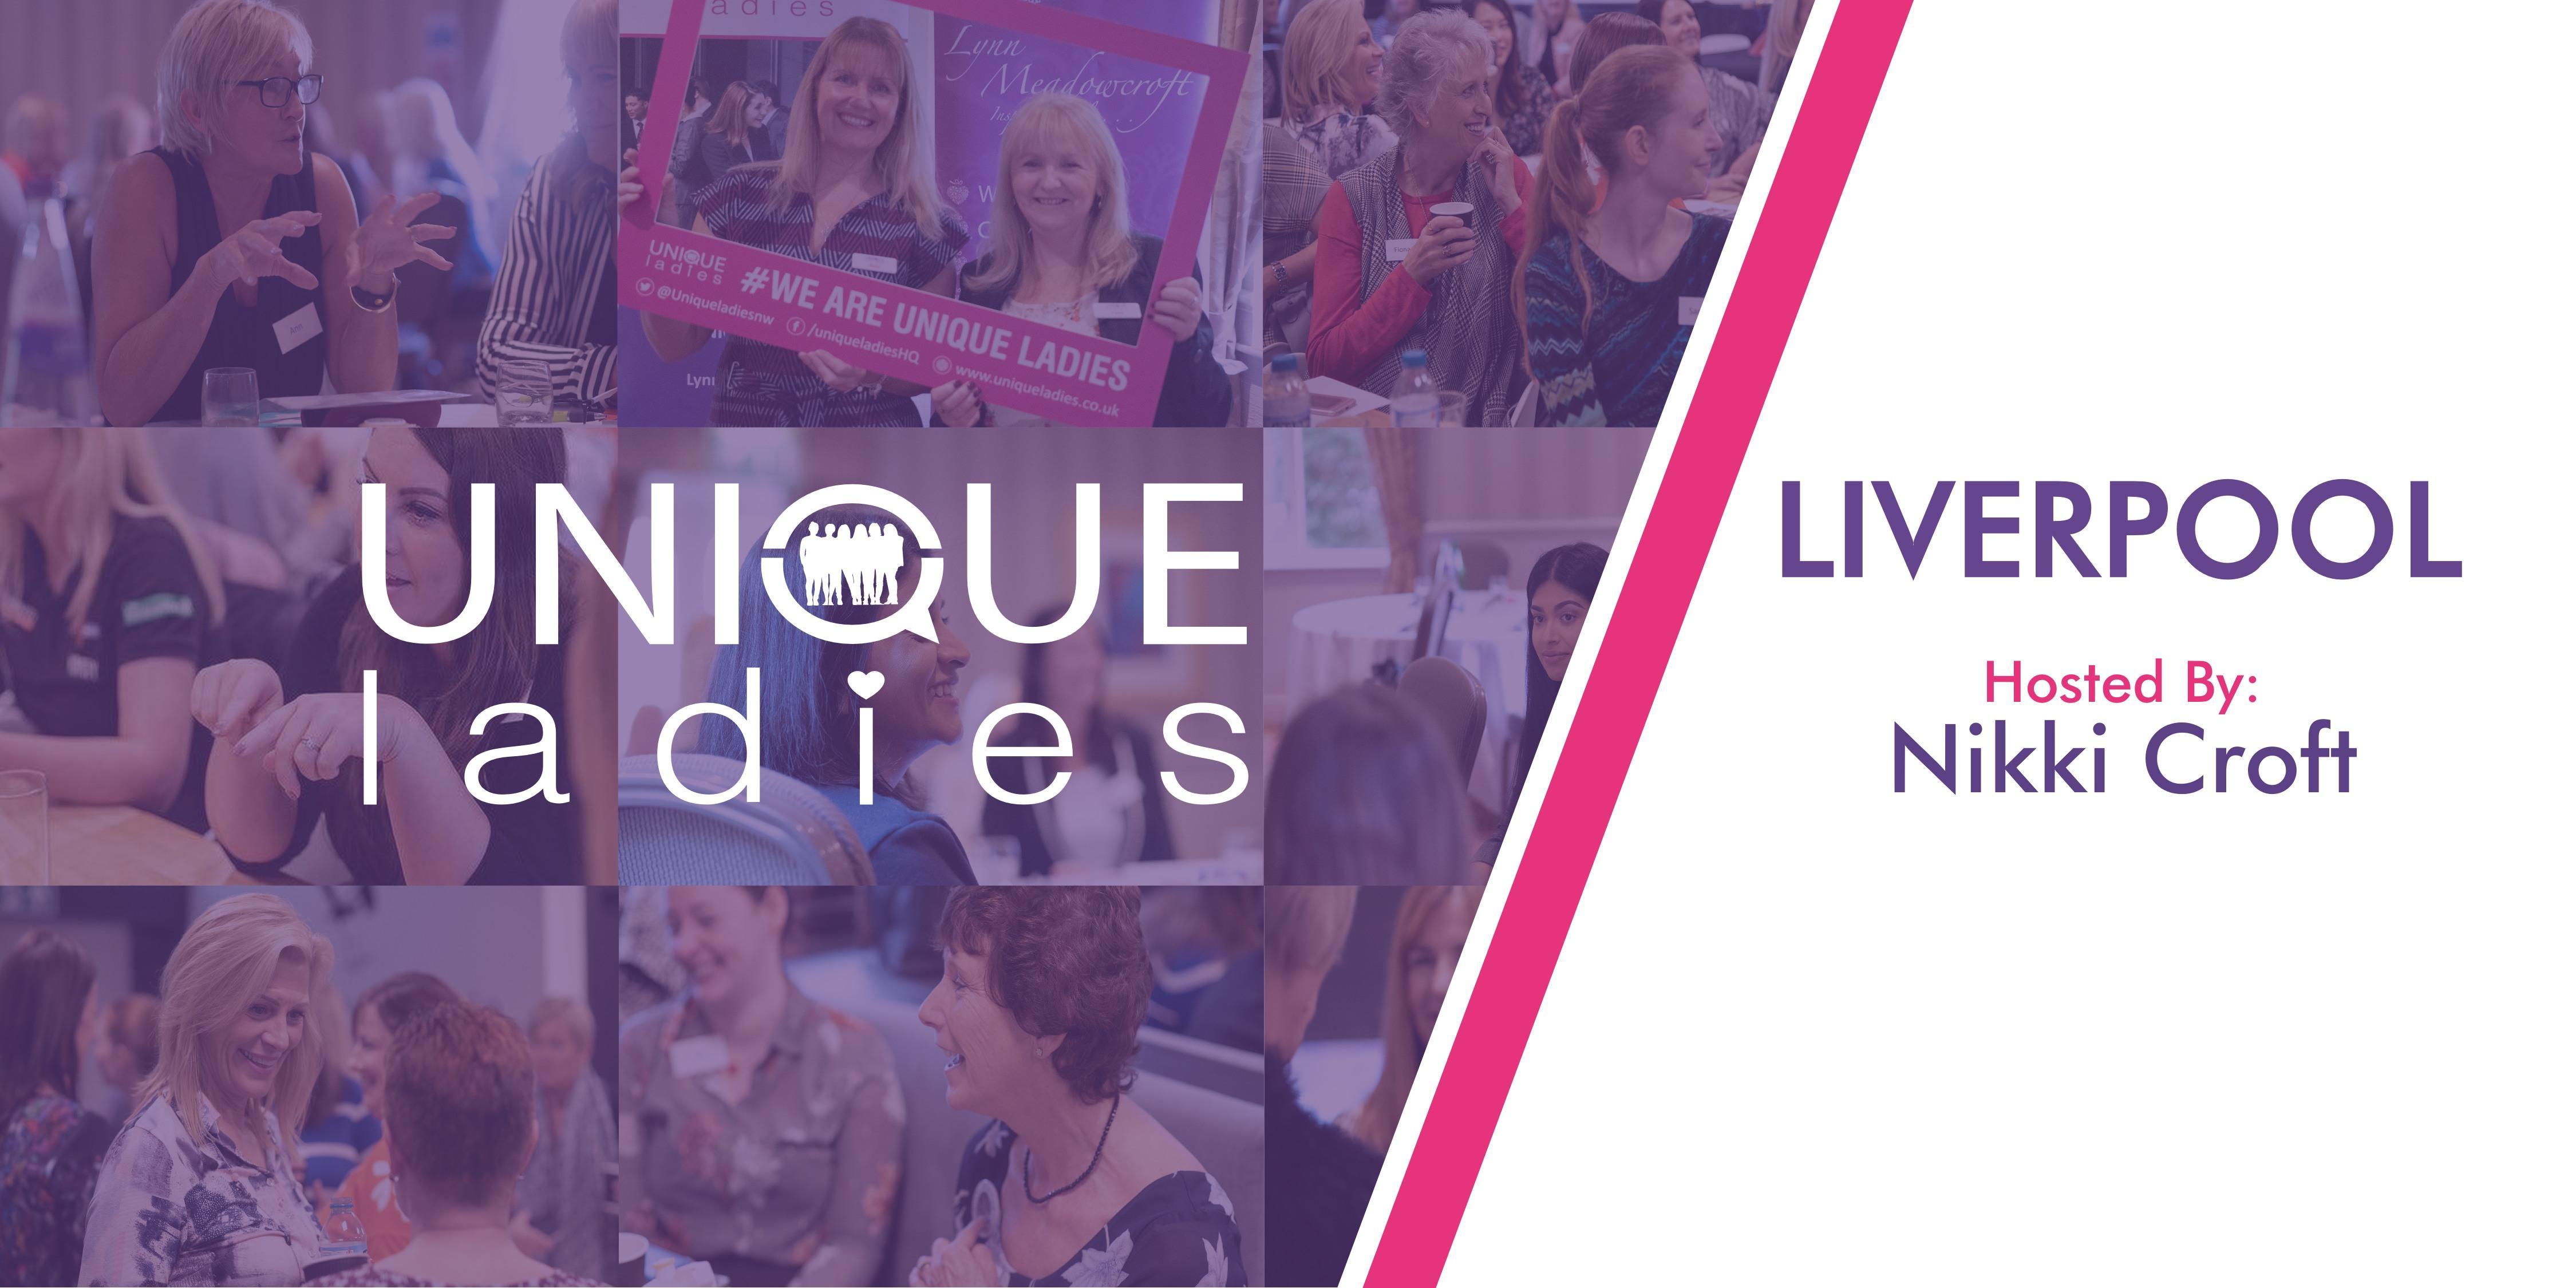 Unique Ladies Business Networking Liverpool